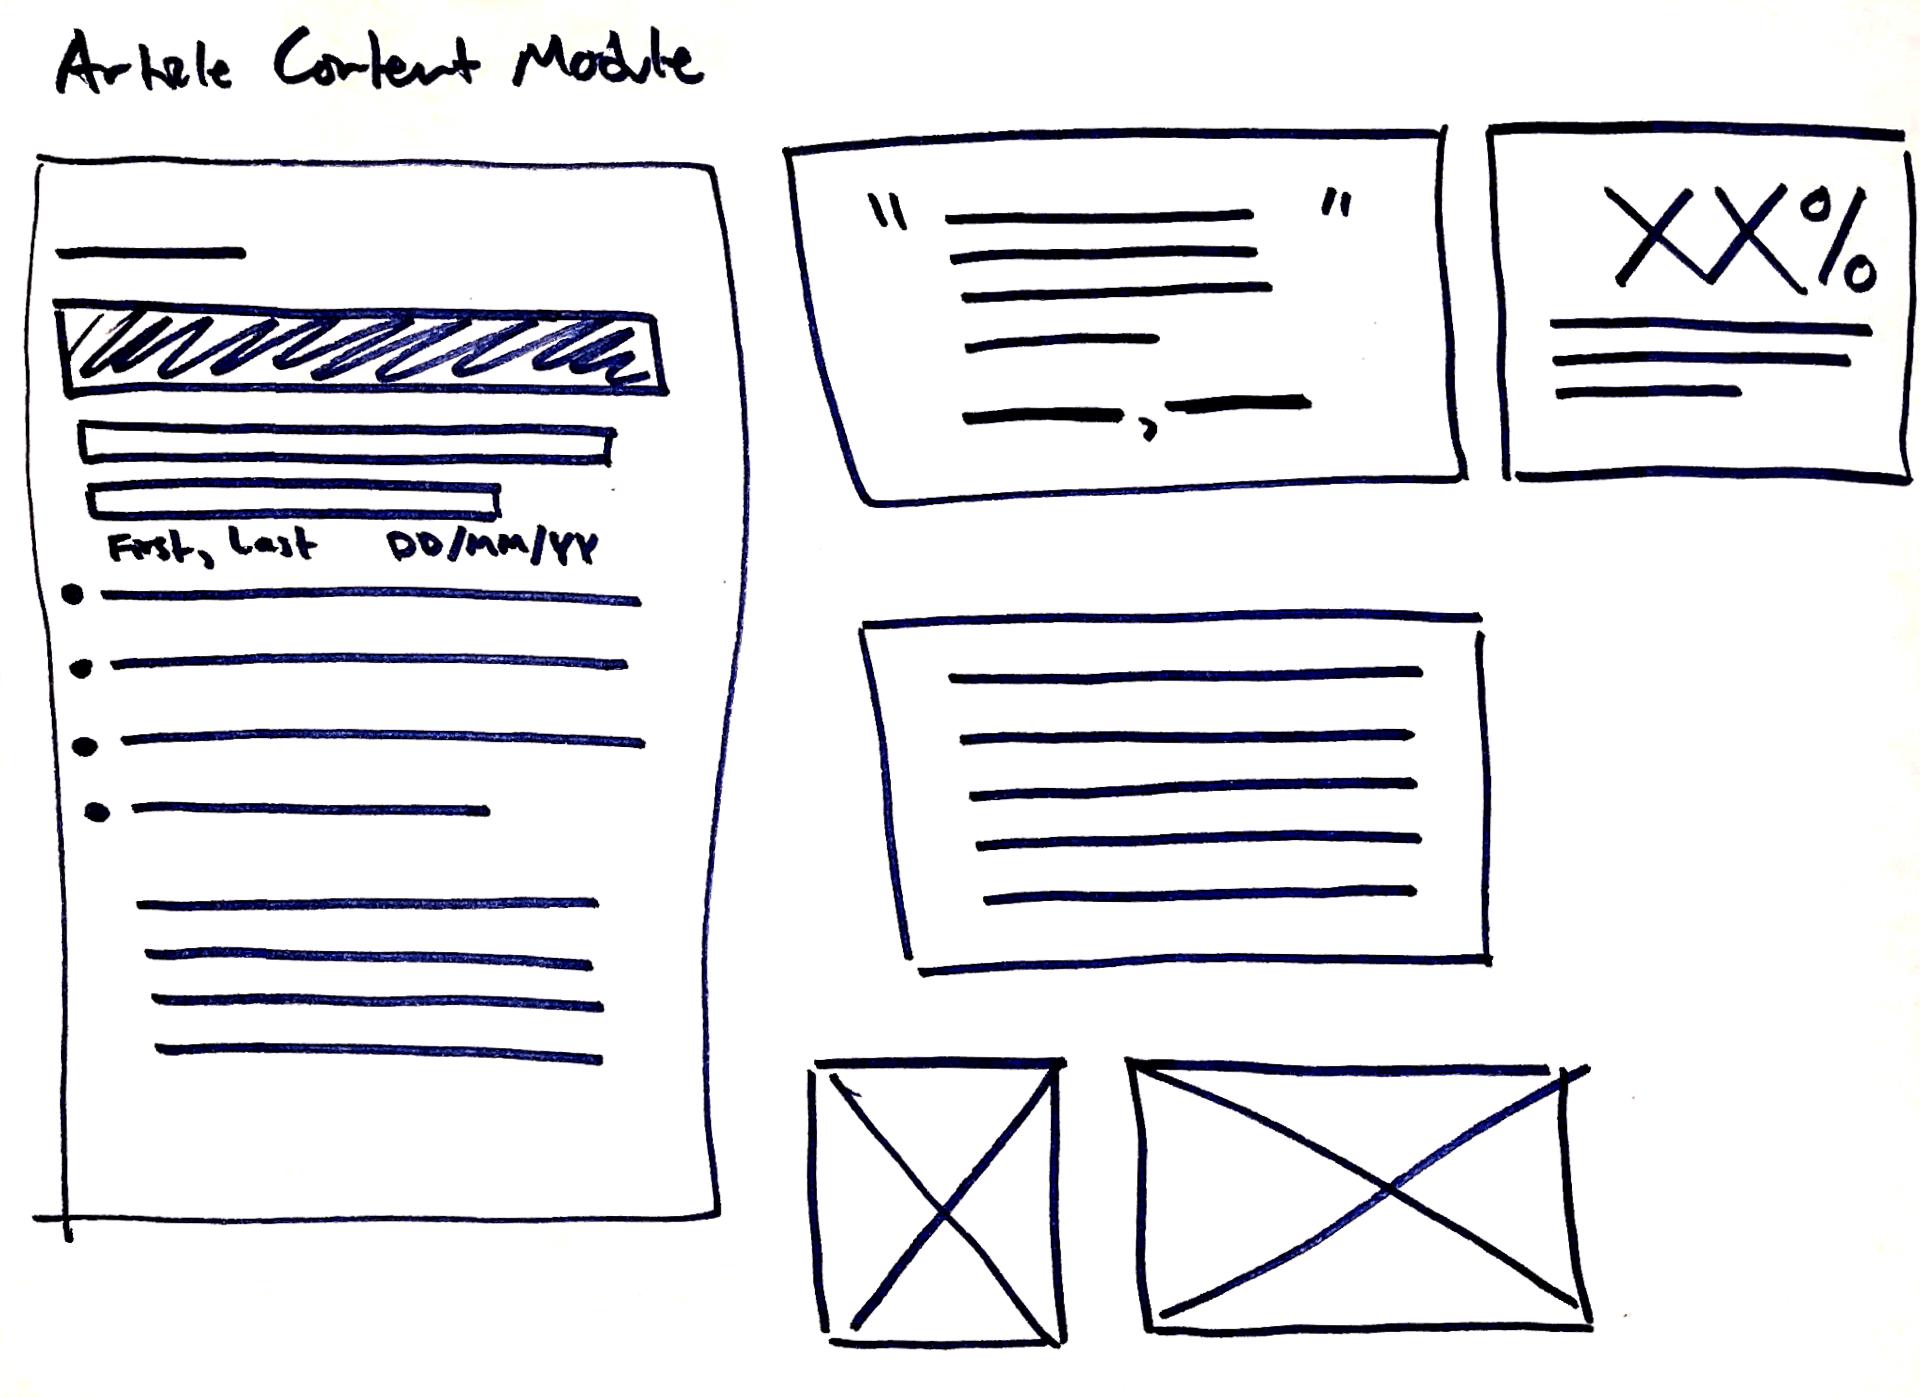 Article Content Module